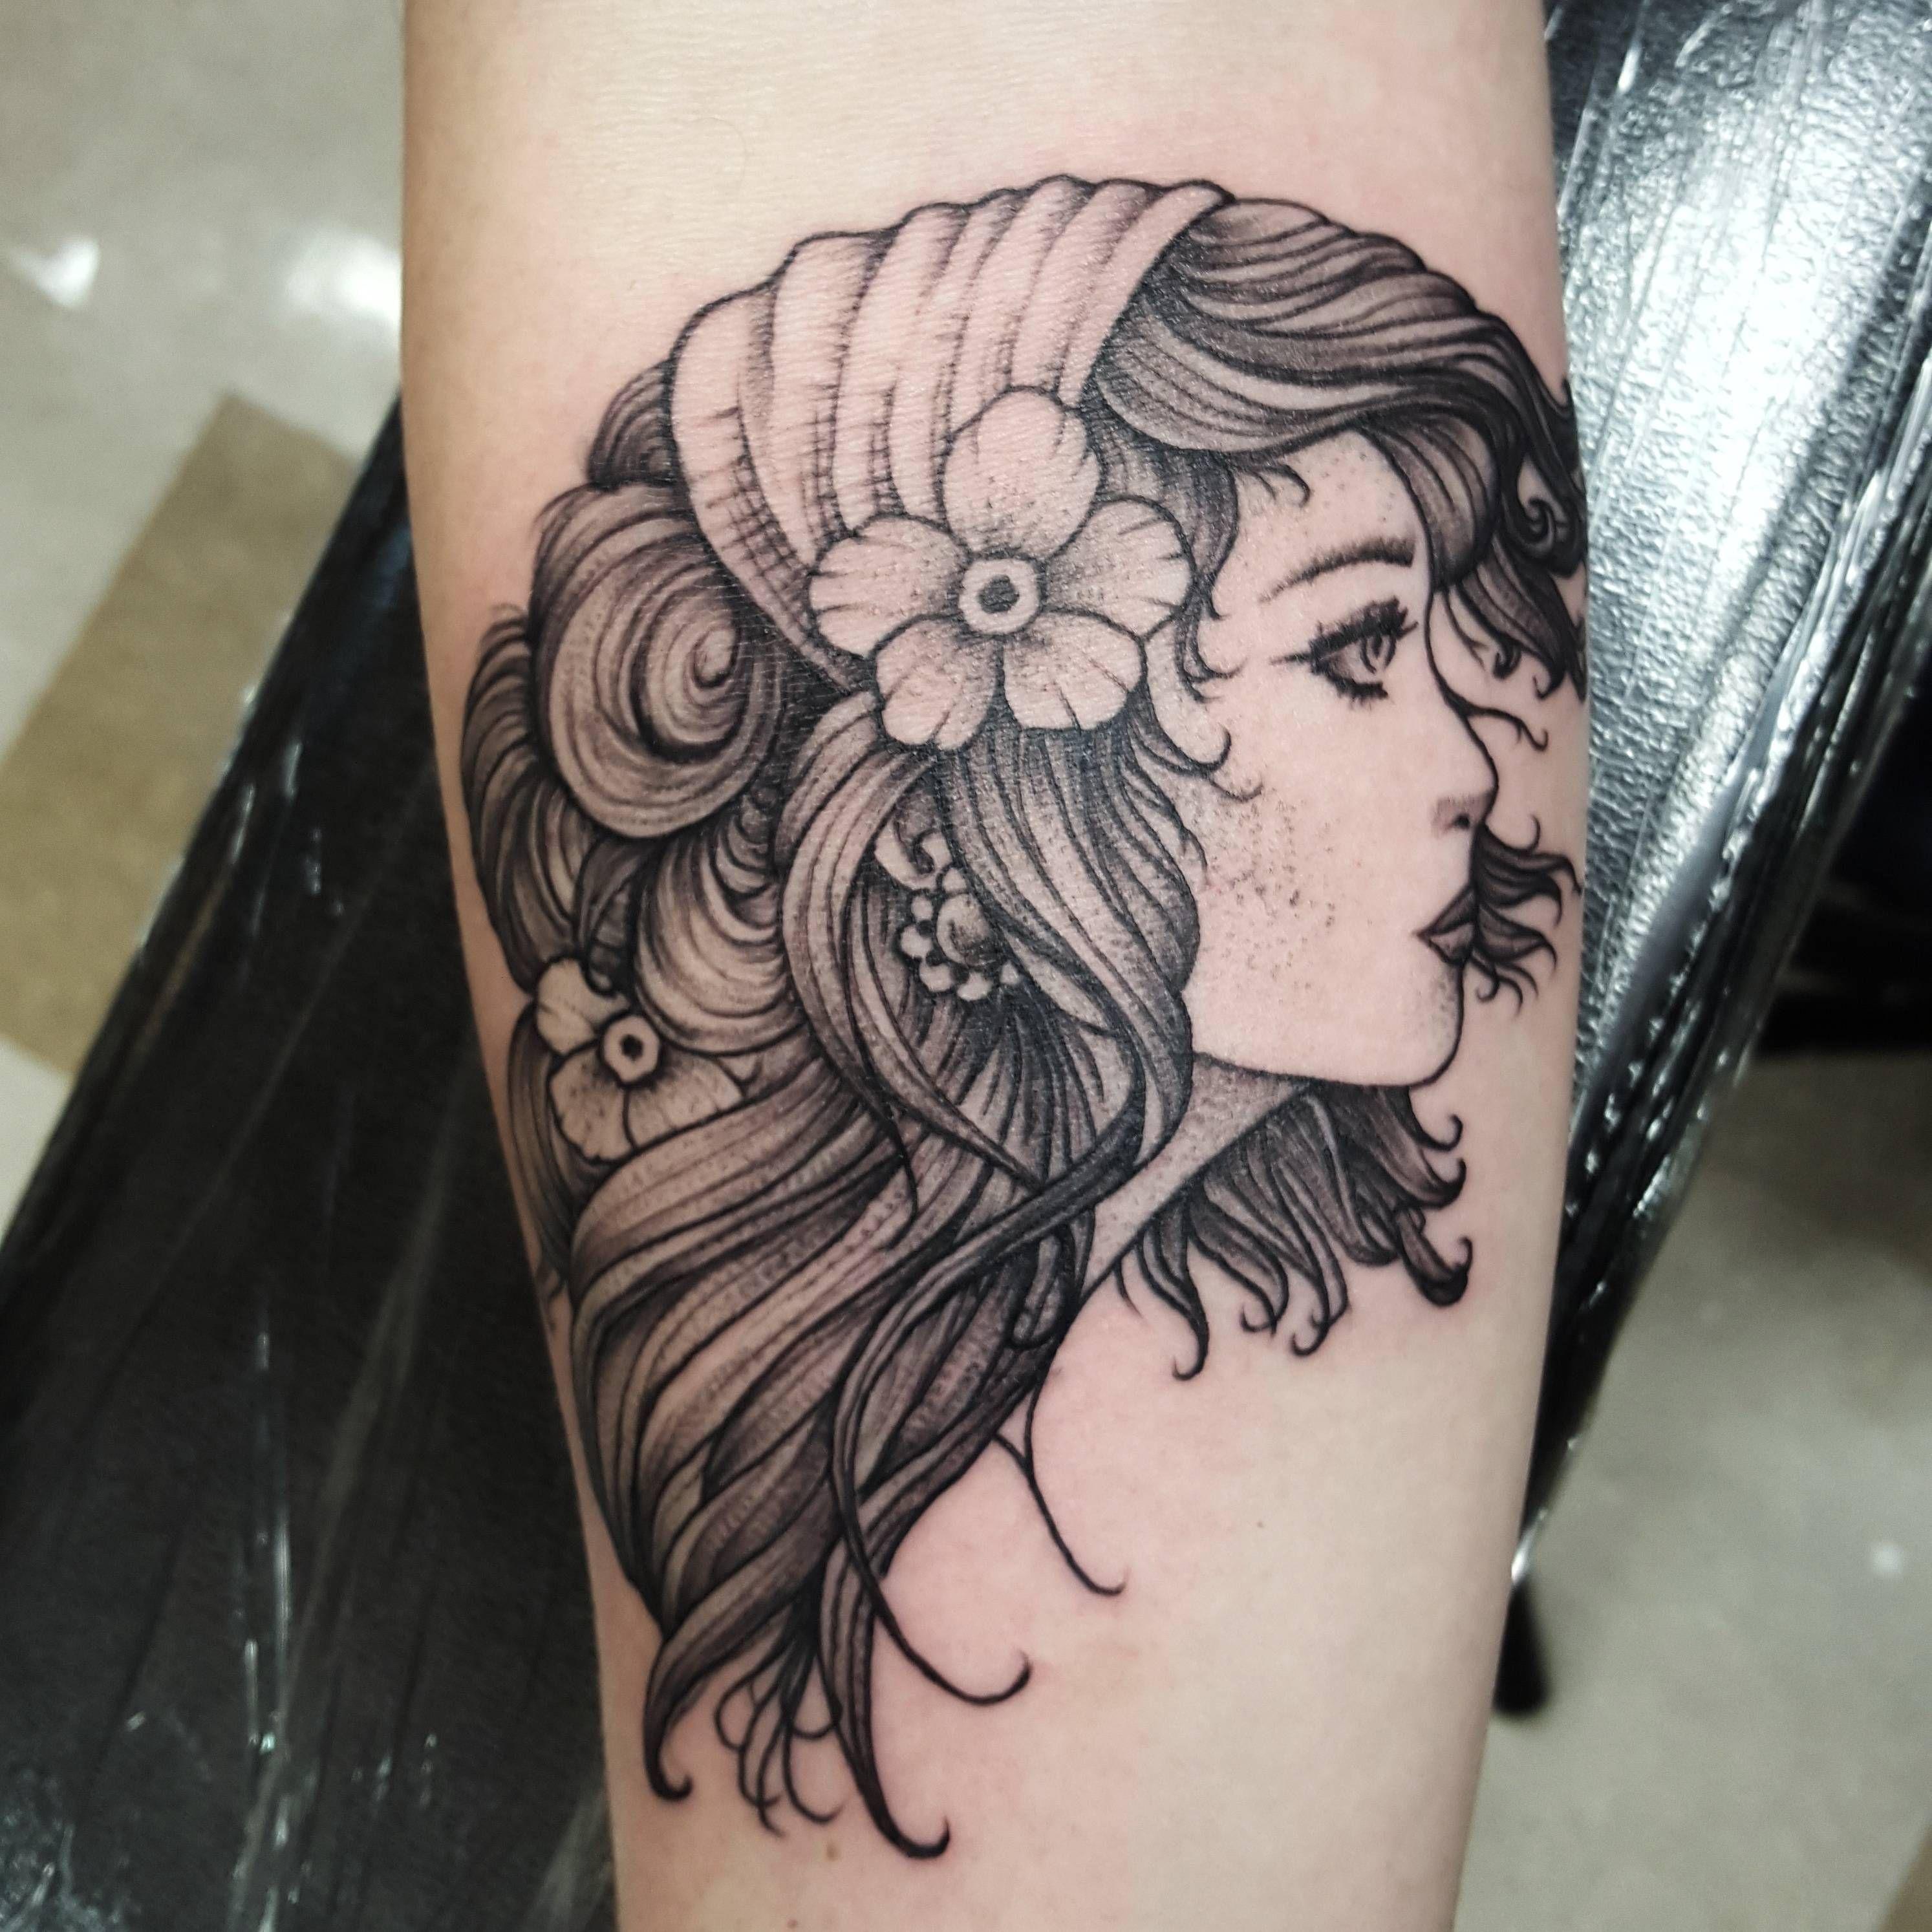 Gypsy Woman, Blackwork Style. By Patrick Thomas, Tattoo